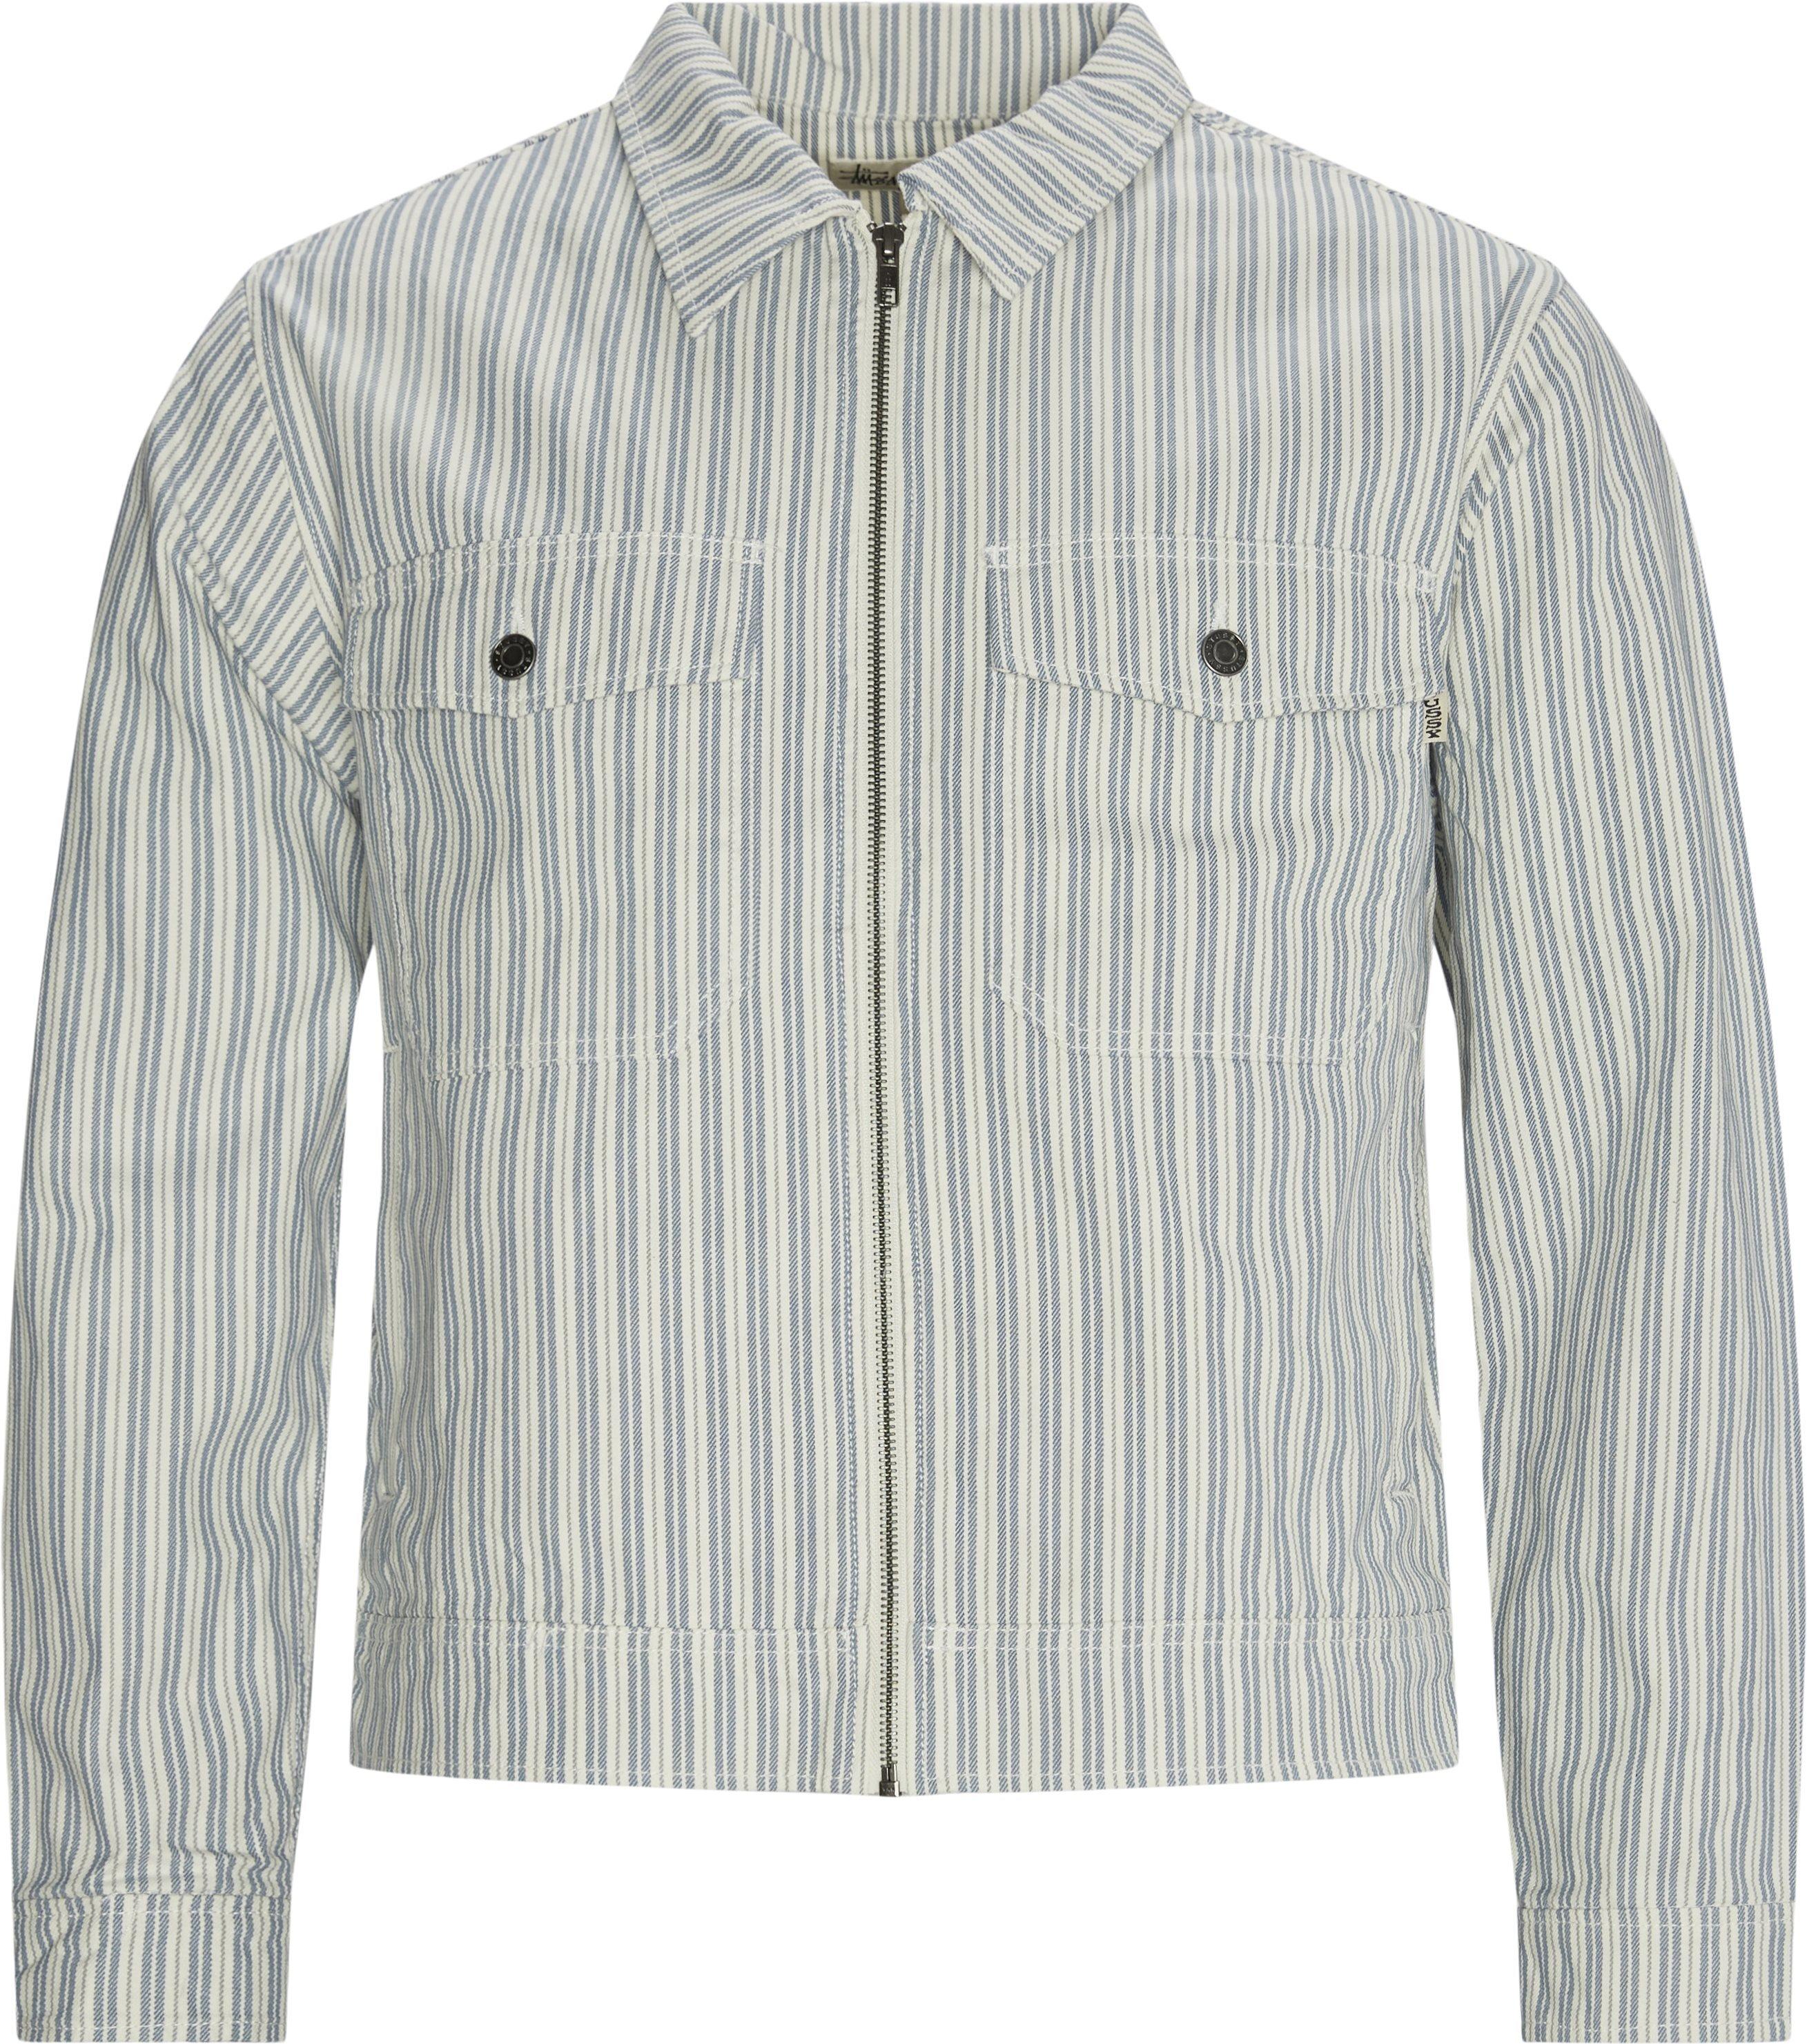 Stripe Garage Jacket - Jackets - Regular - Blue